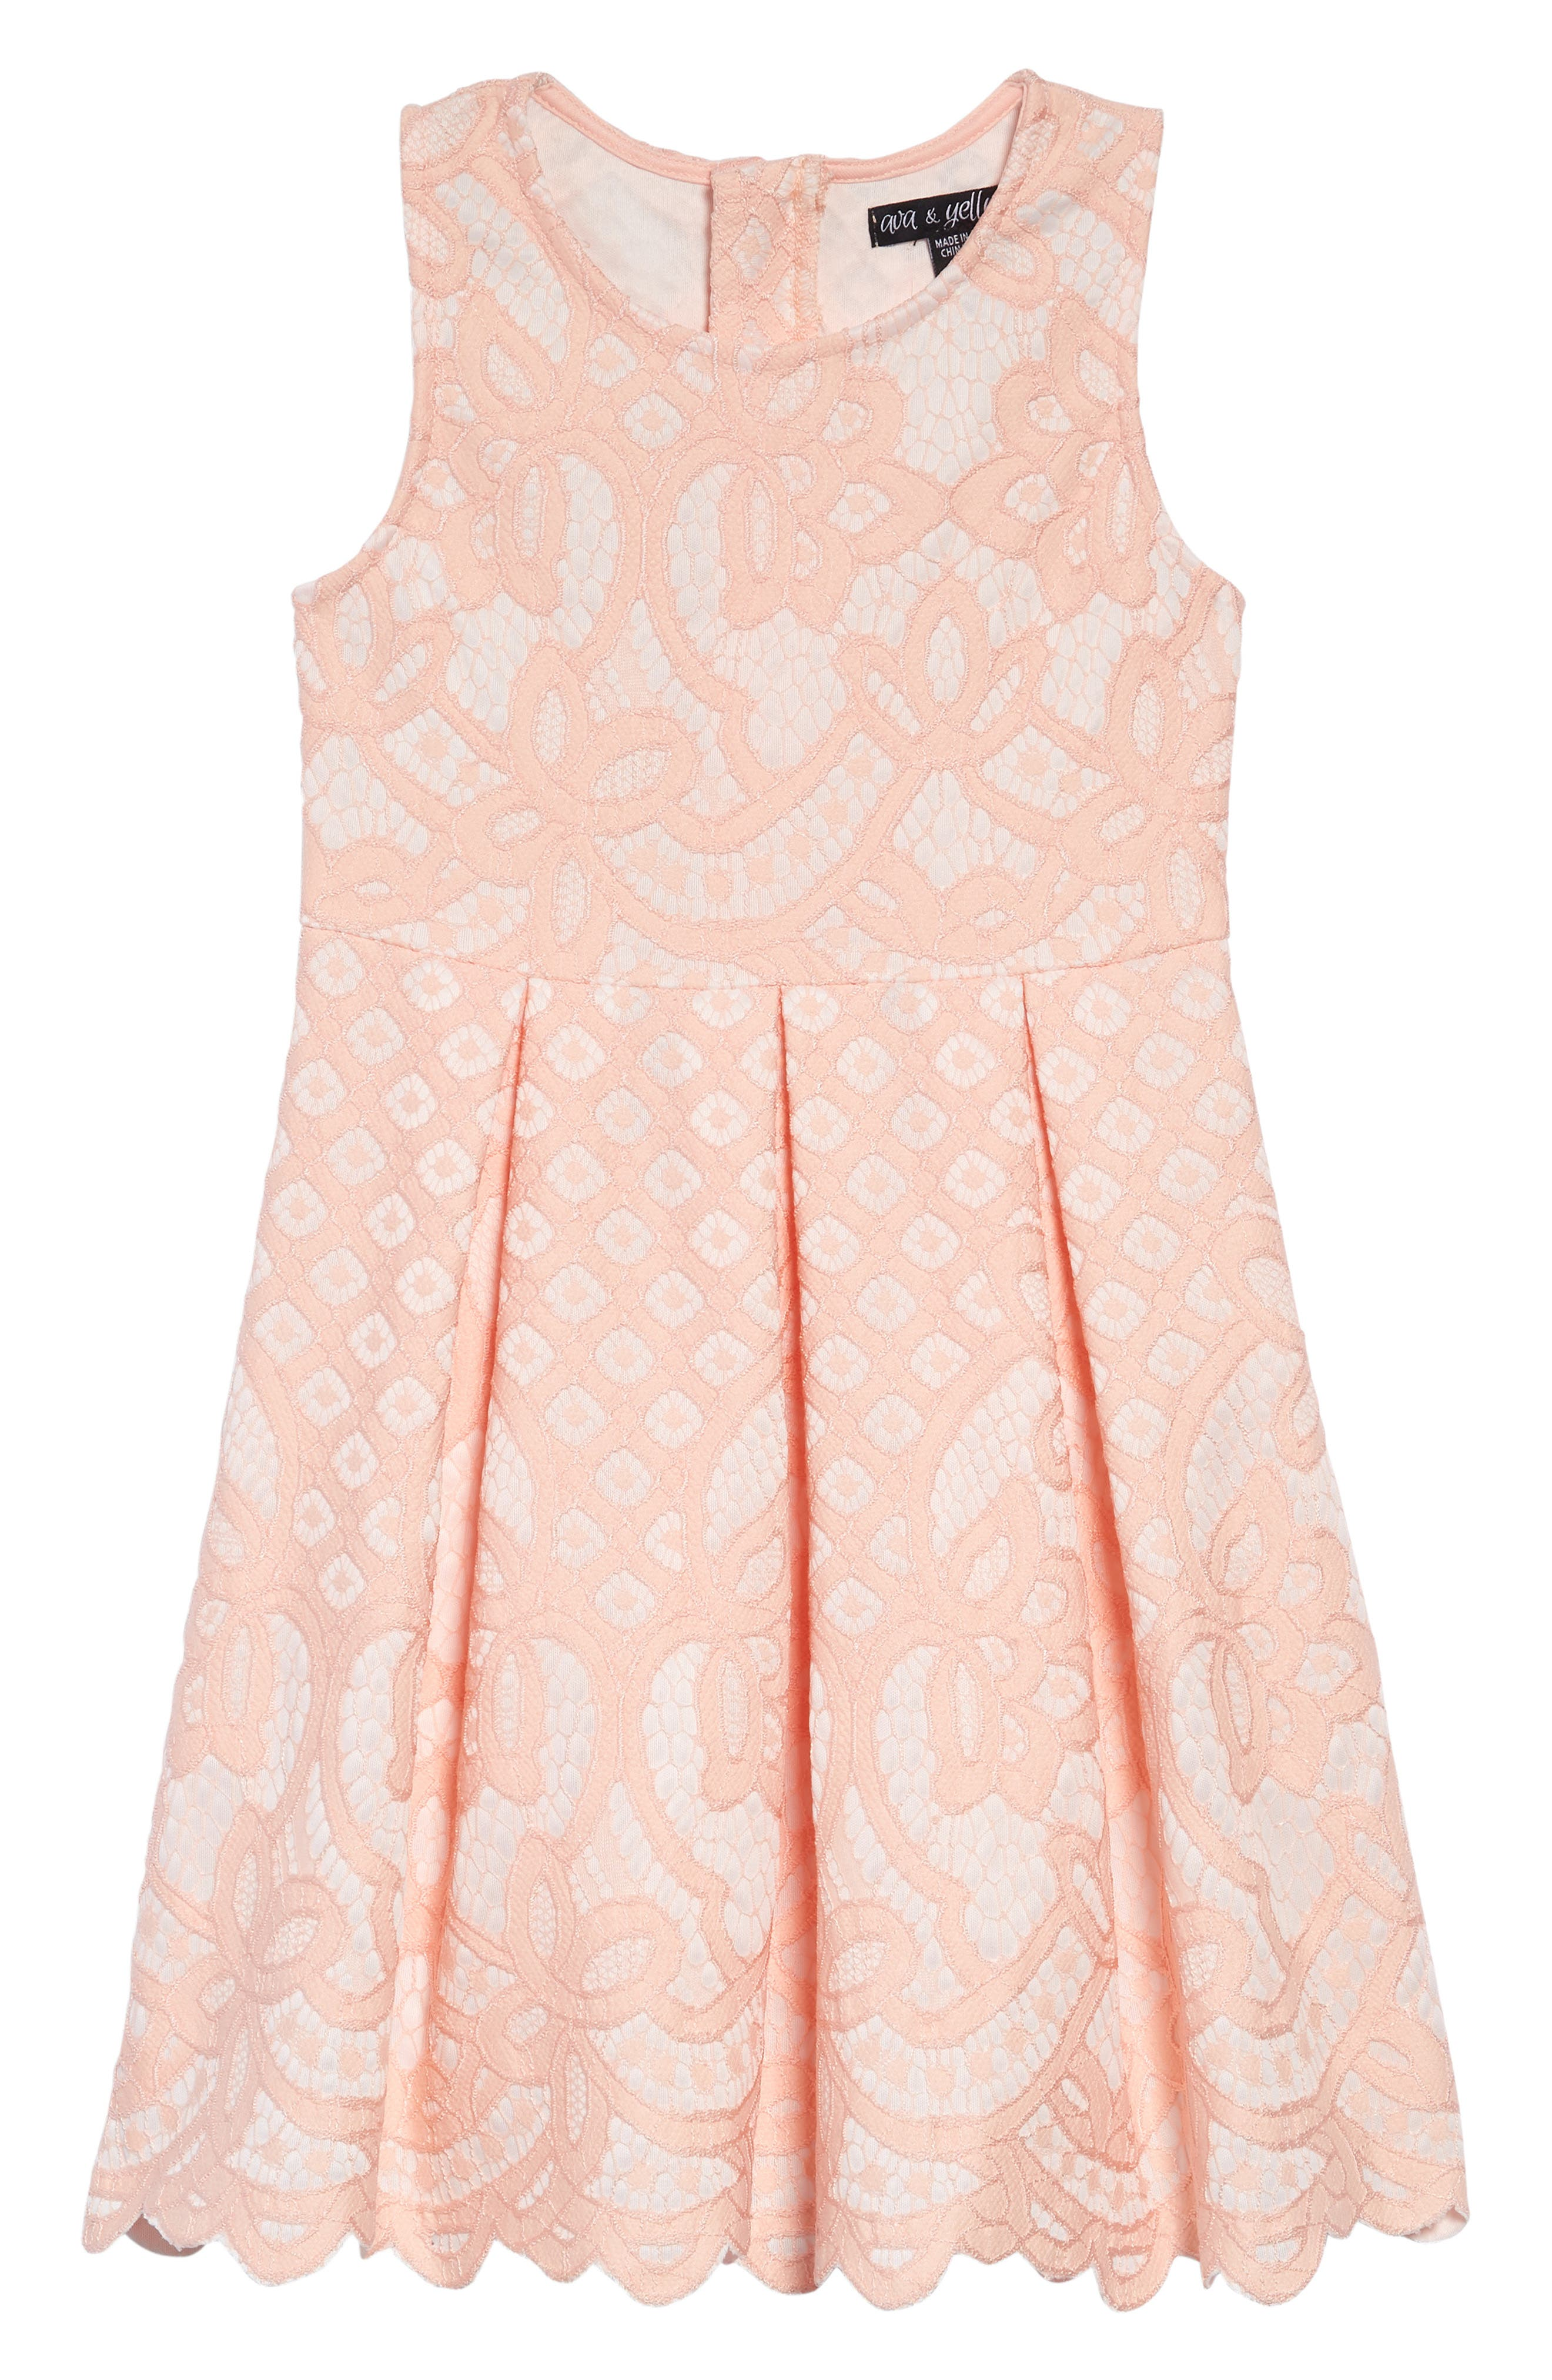 Two Tone Lace Dress,                         Main,                         color, BLUSH